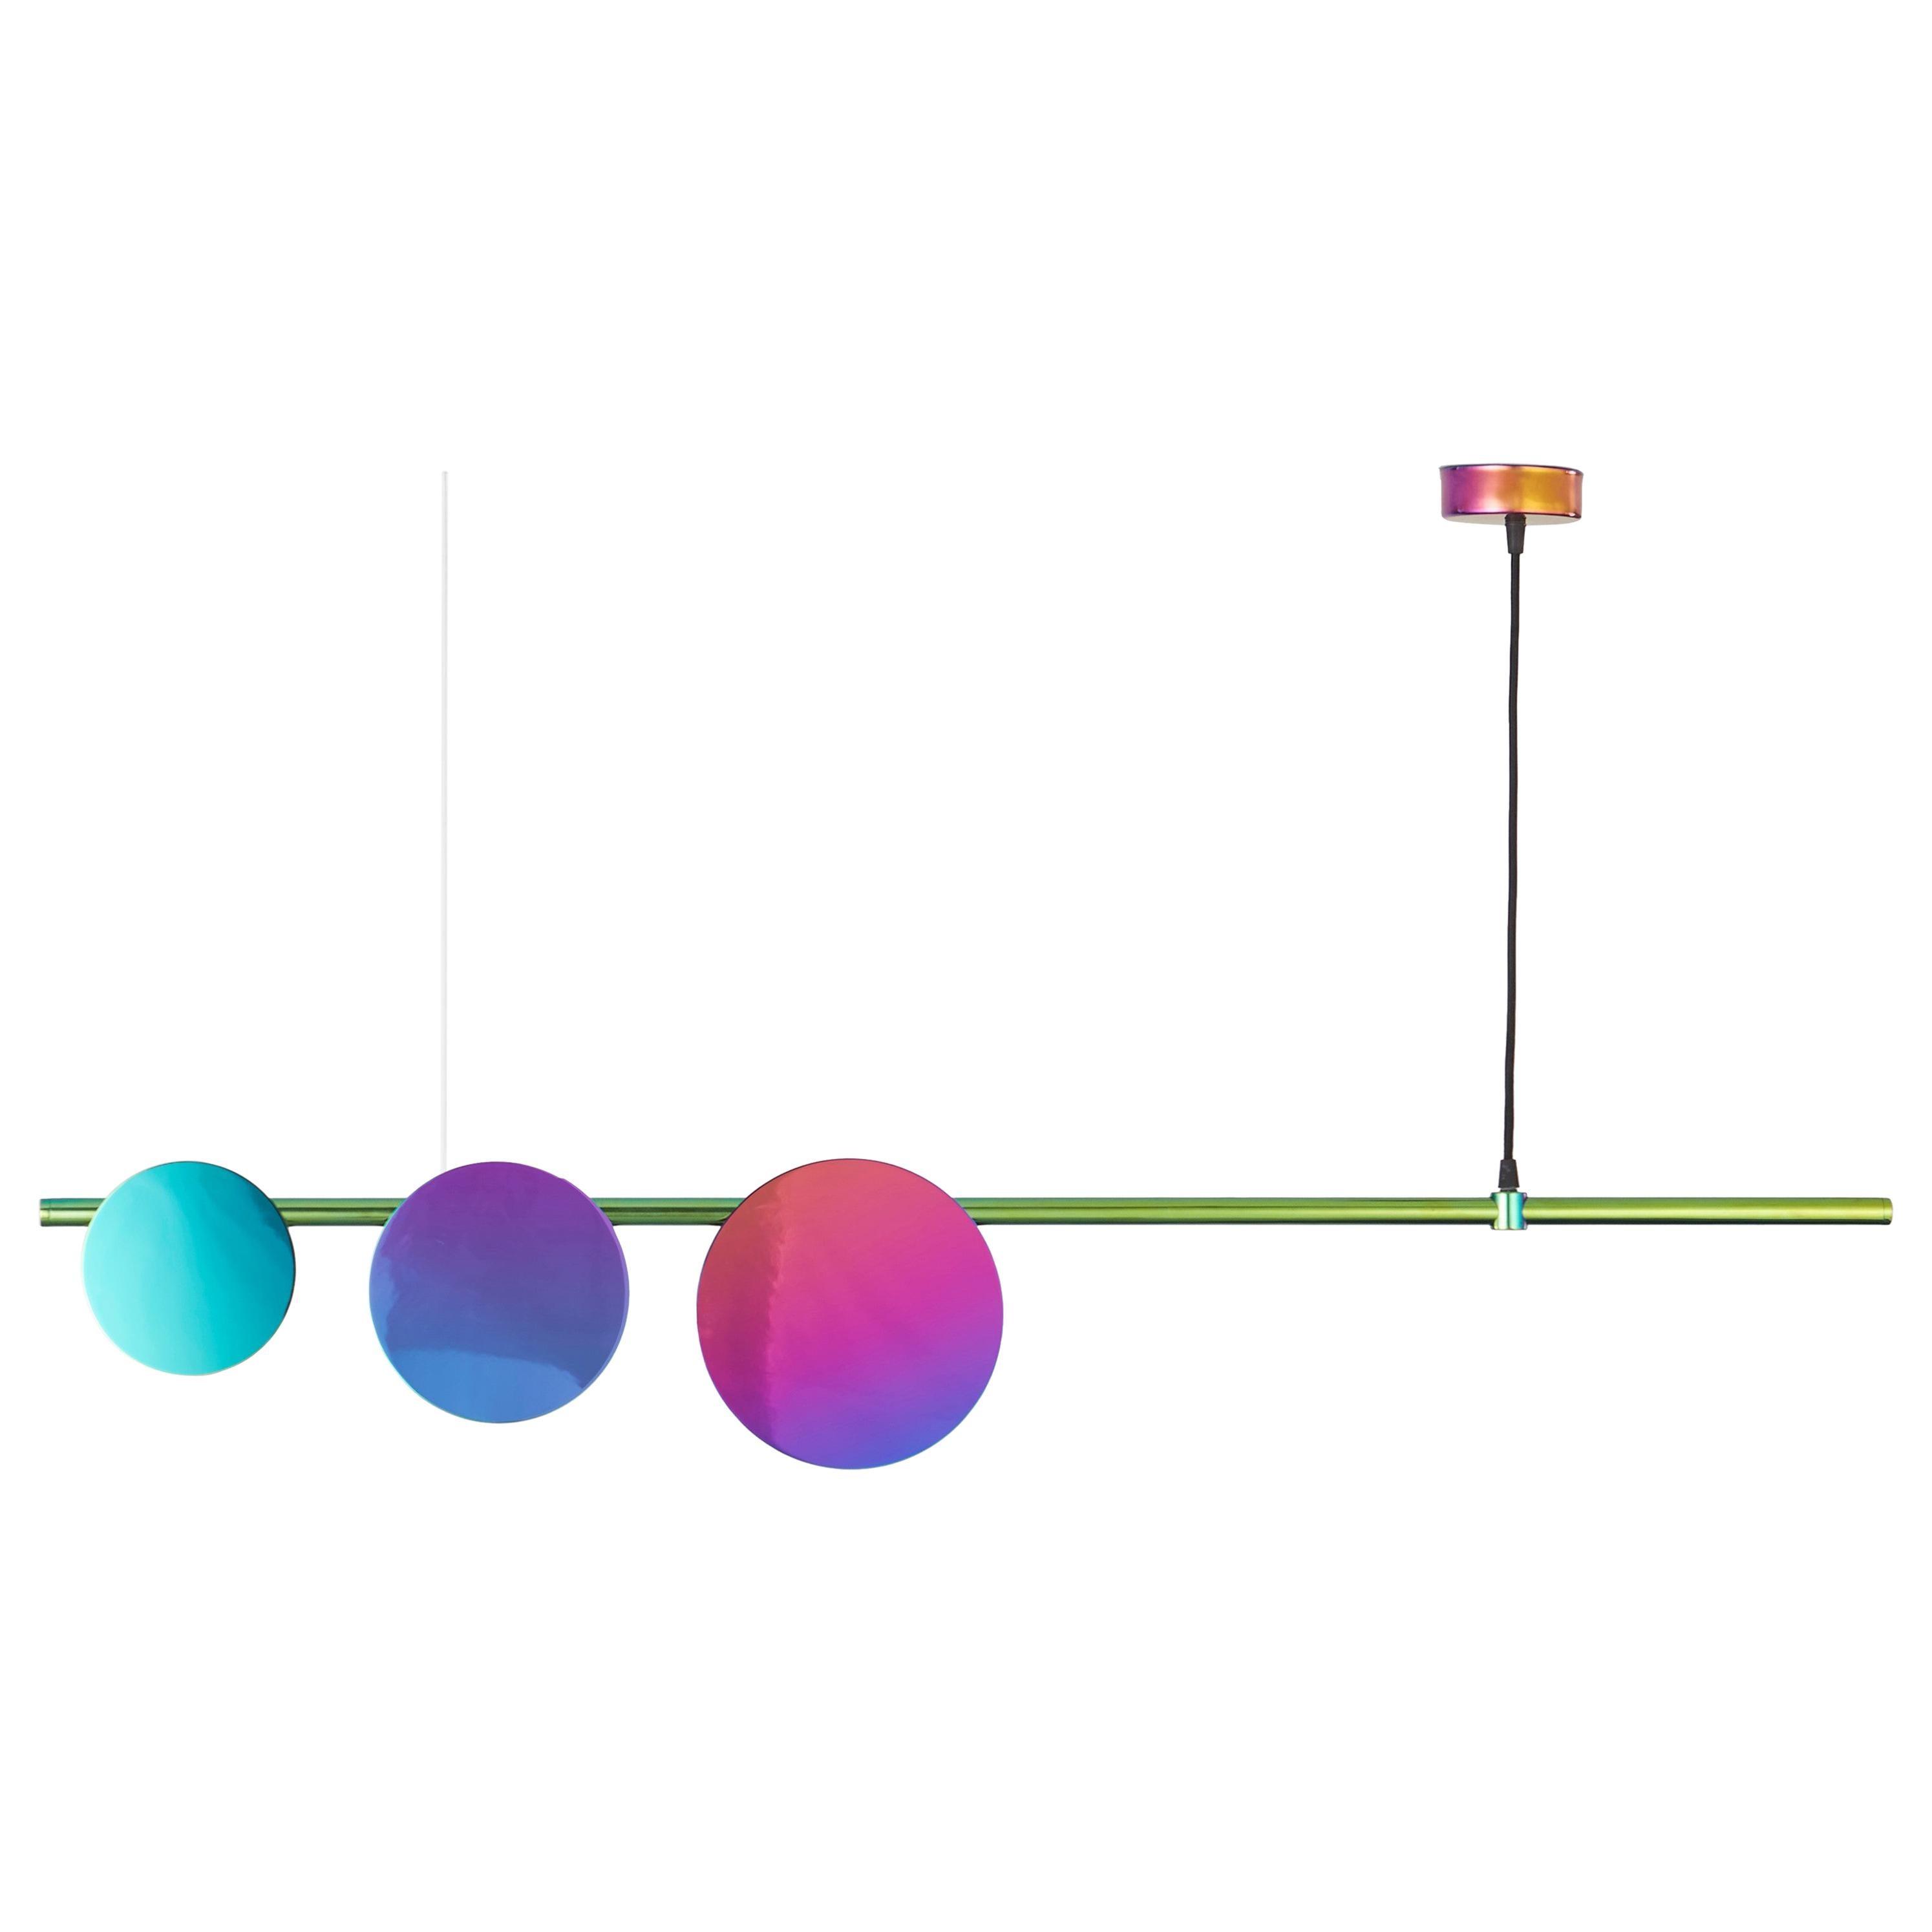 Lino 3 Chandlier Rainbow by Saumil Suchak